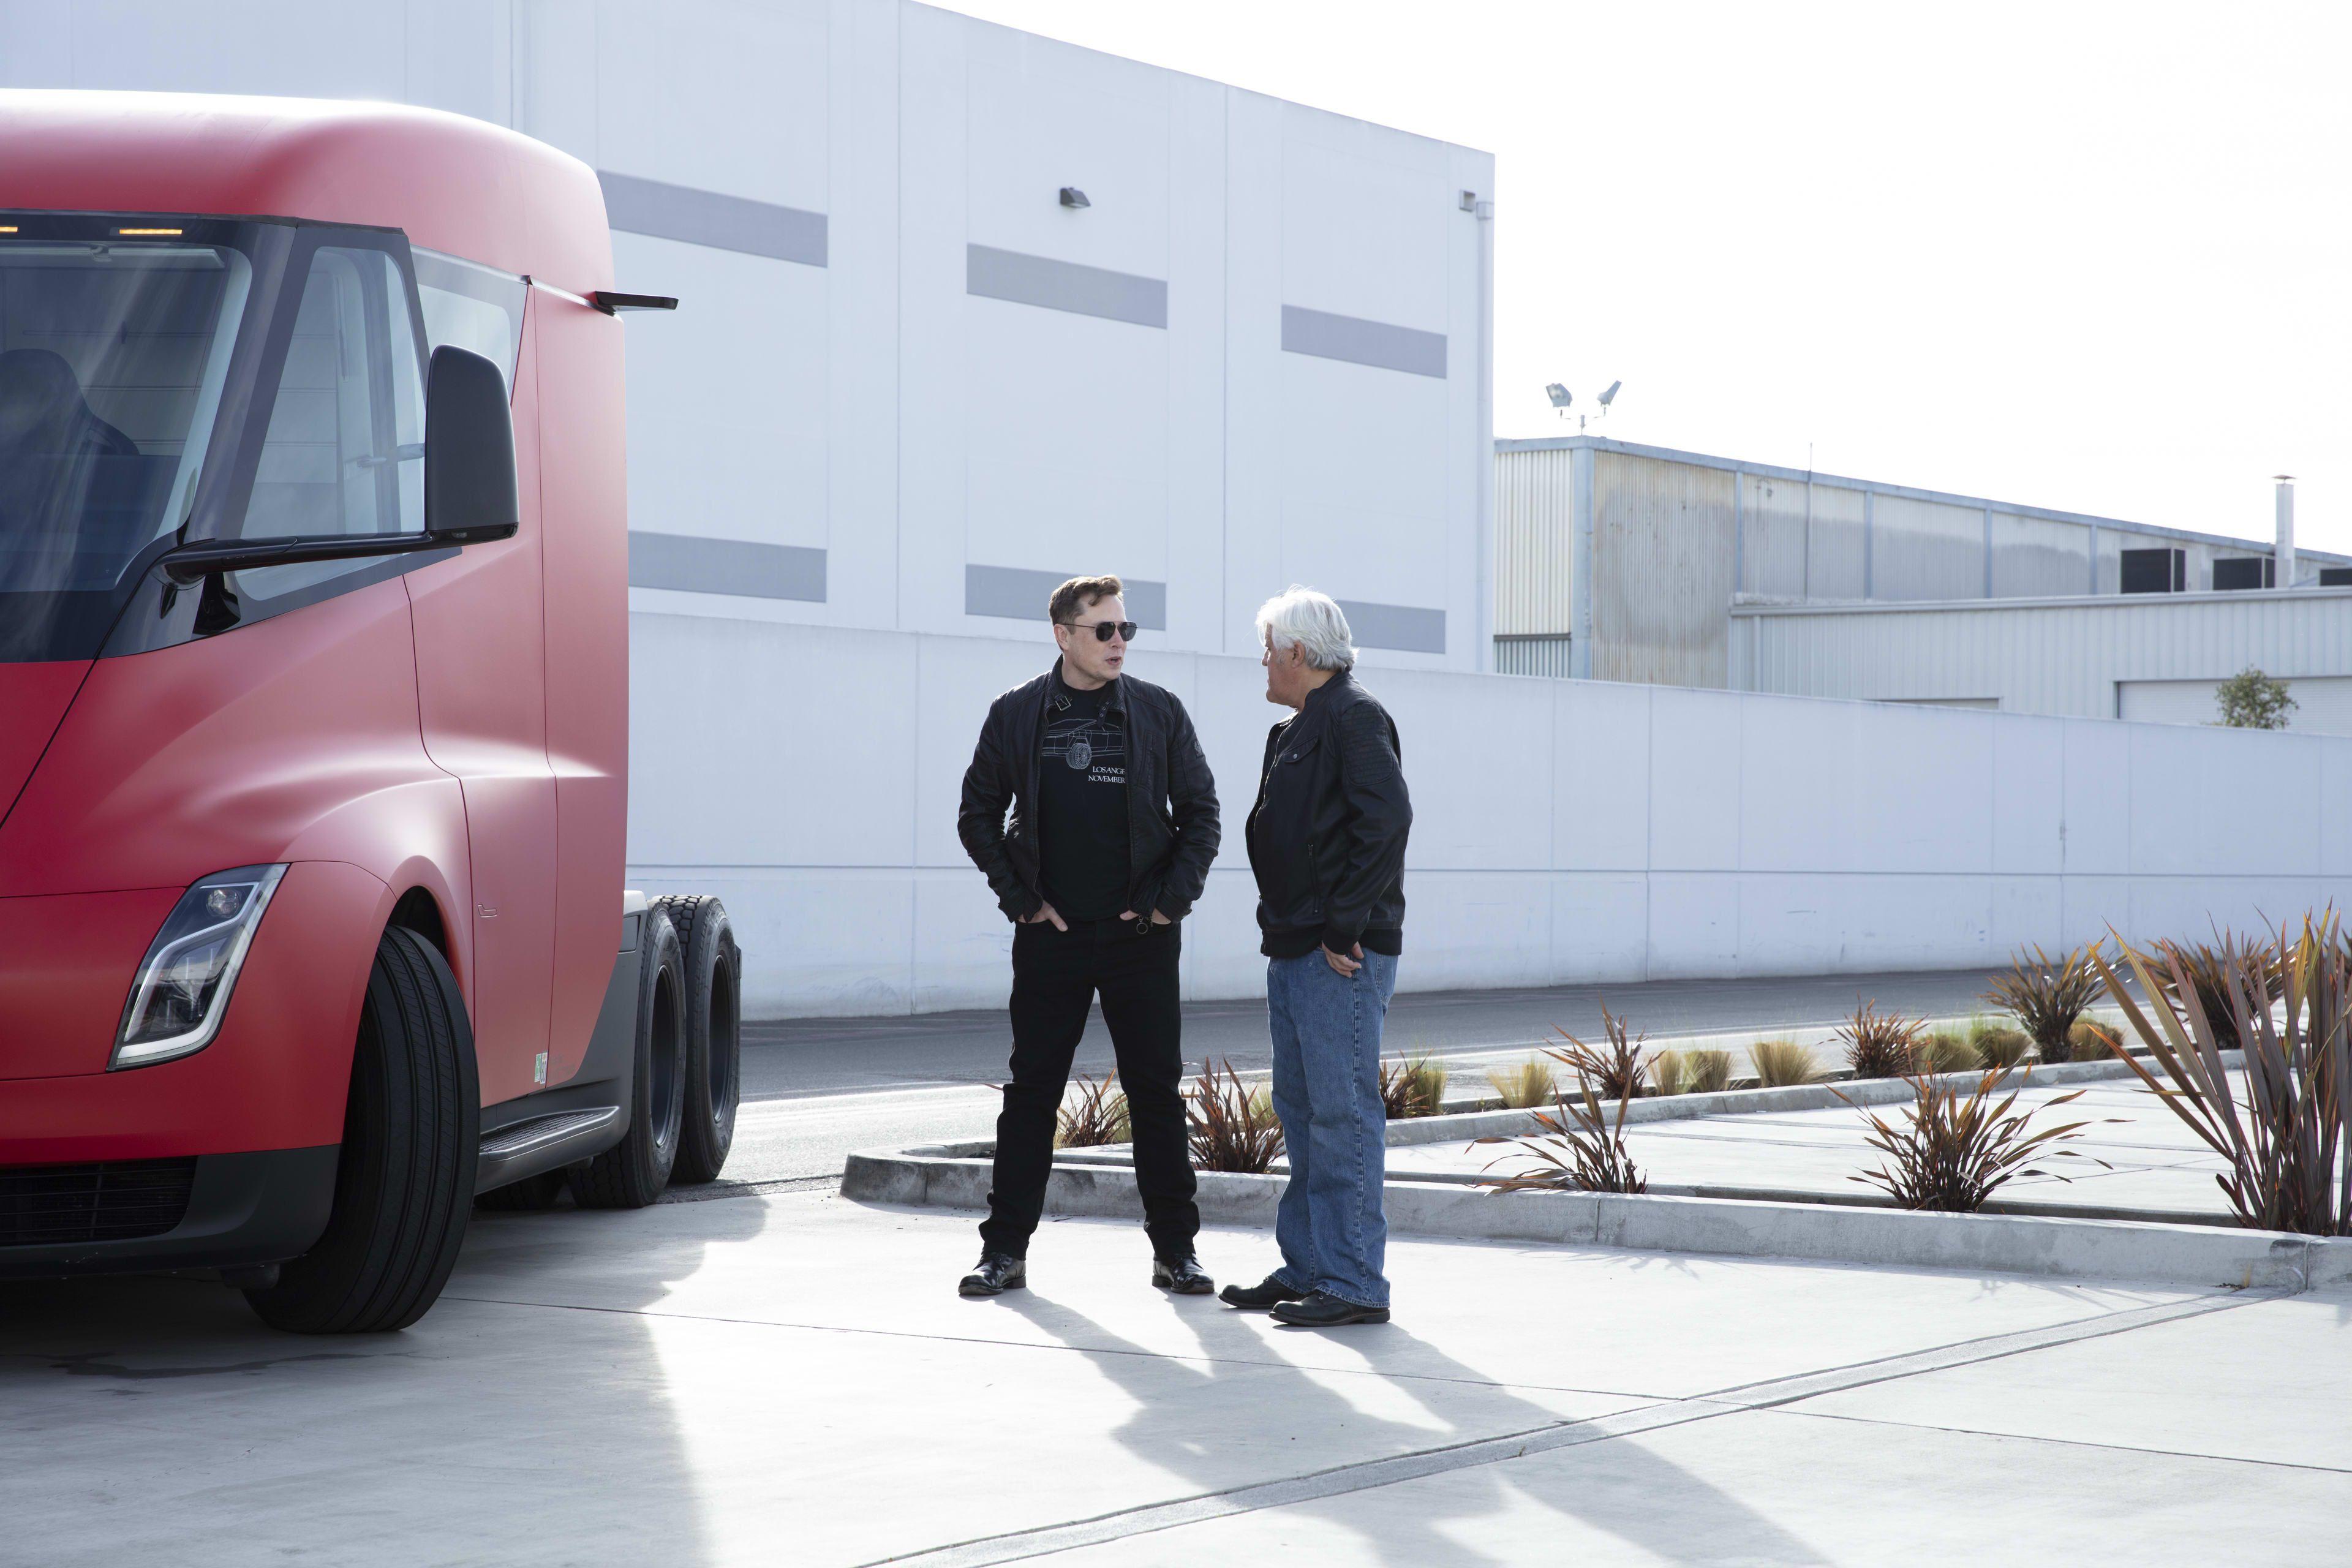 Elon Musk Let Jay Leno Drive A Cybertruck Through The Boring Company S Tunnel Underneath La Take A Look Jay Leno Garage Elon Musk Tesla Electric Truck